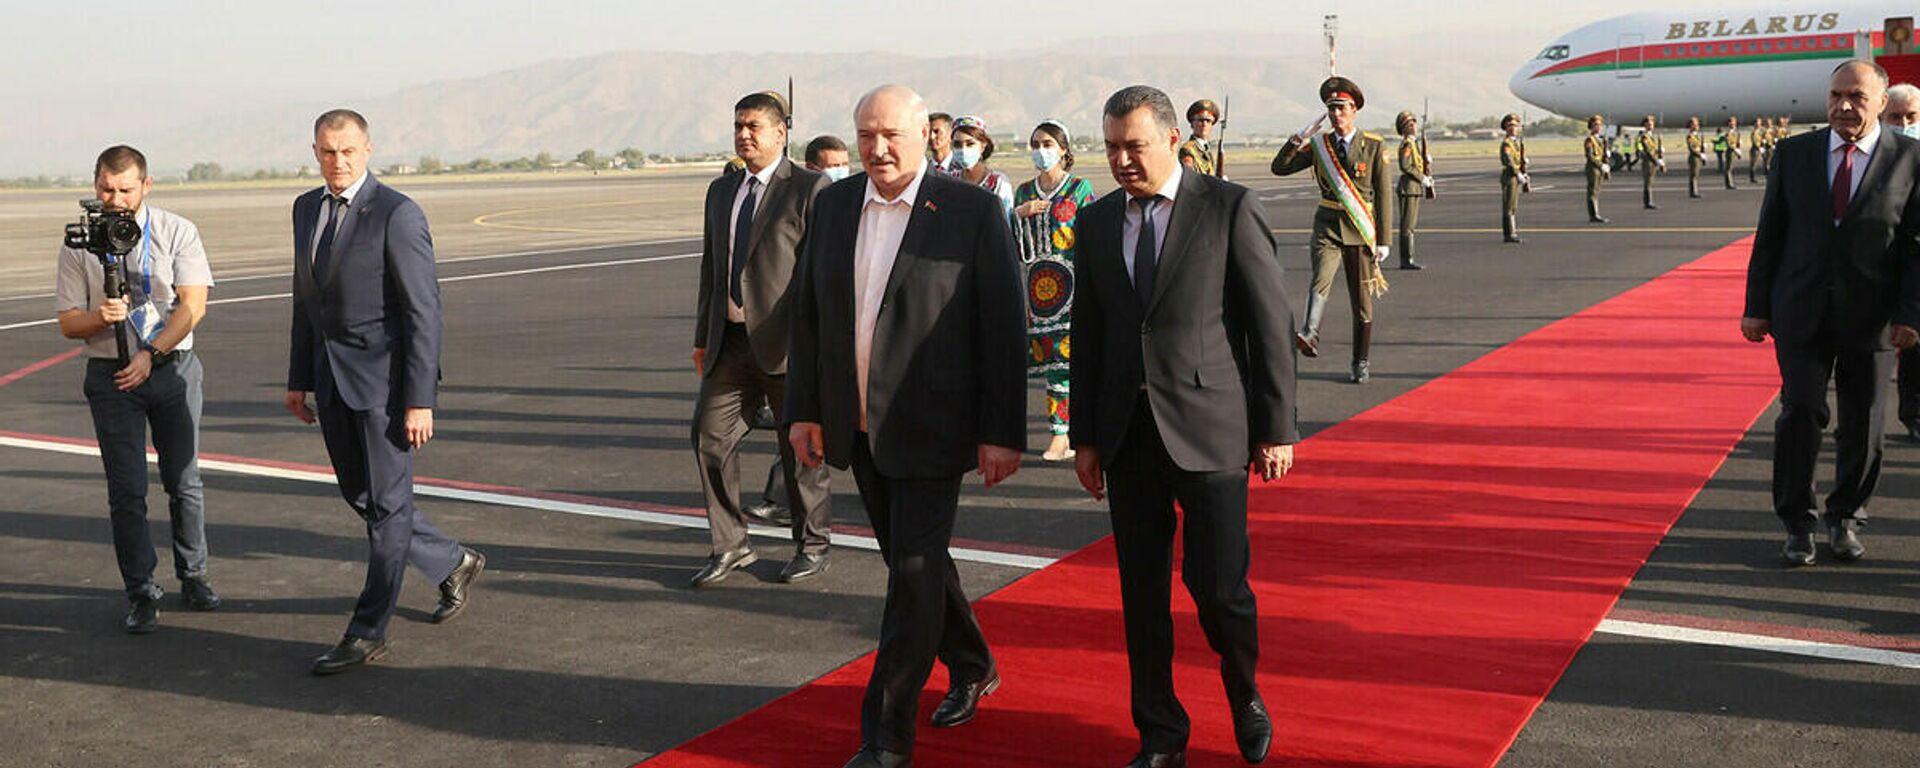 Президент Беларуси Александр Лукашенко 15 сентября прилетел с рабочим визитом в Таджикистан - Sputnik Тоҷикистон, 1920, 15.09.2021